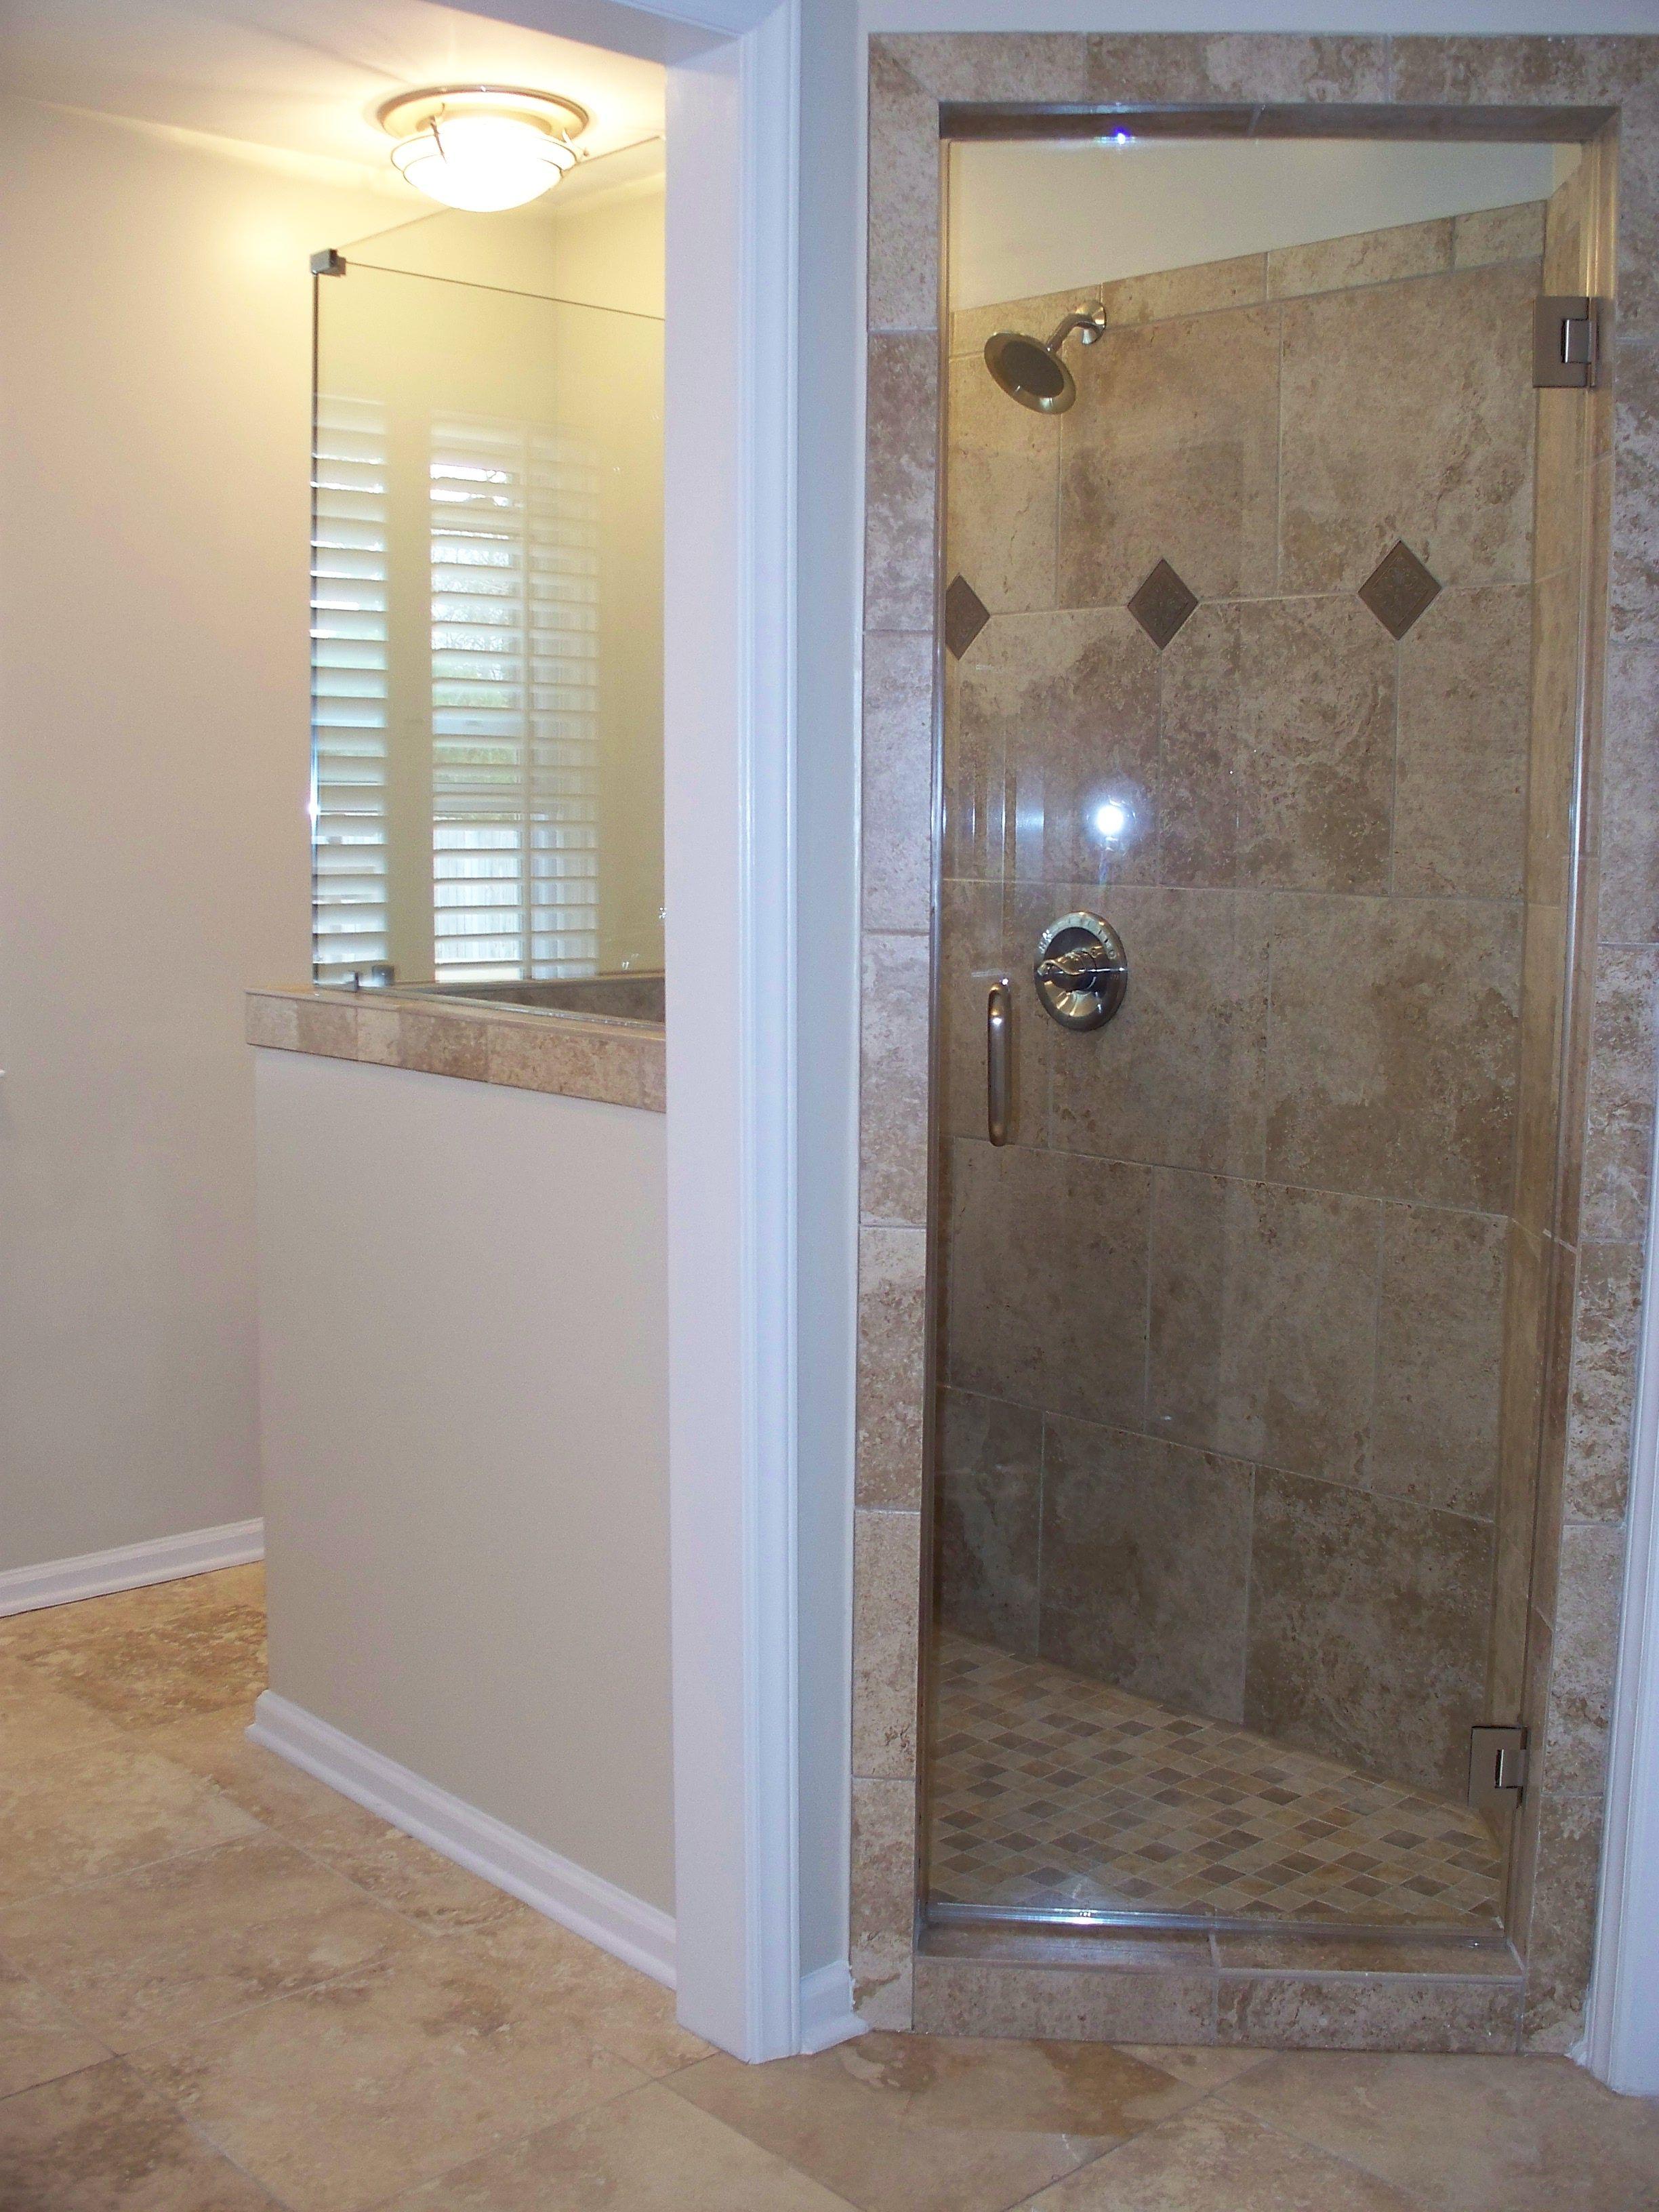 search o worldwide brokerage xlarge splendor shower listings details view doors photos yachtworld